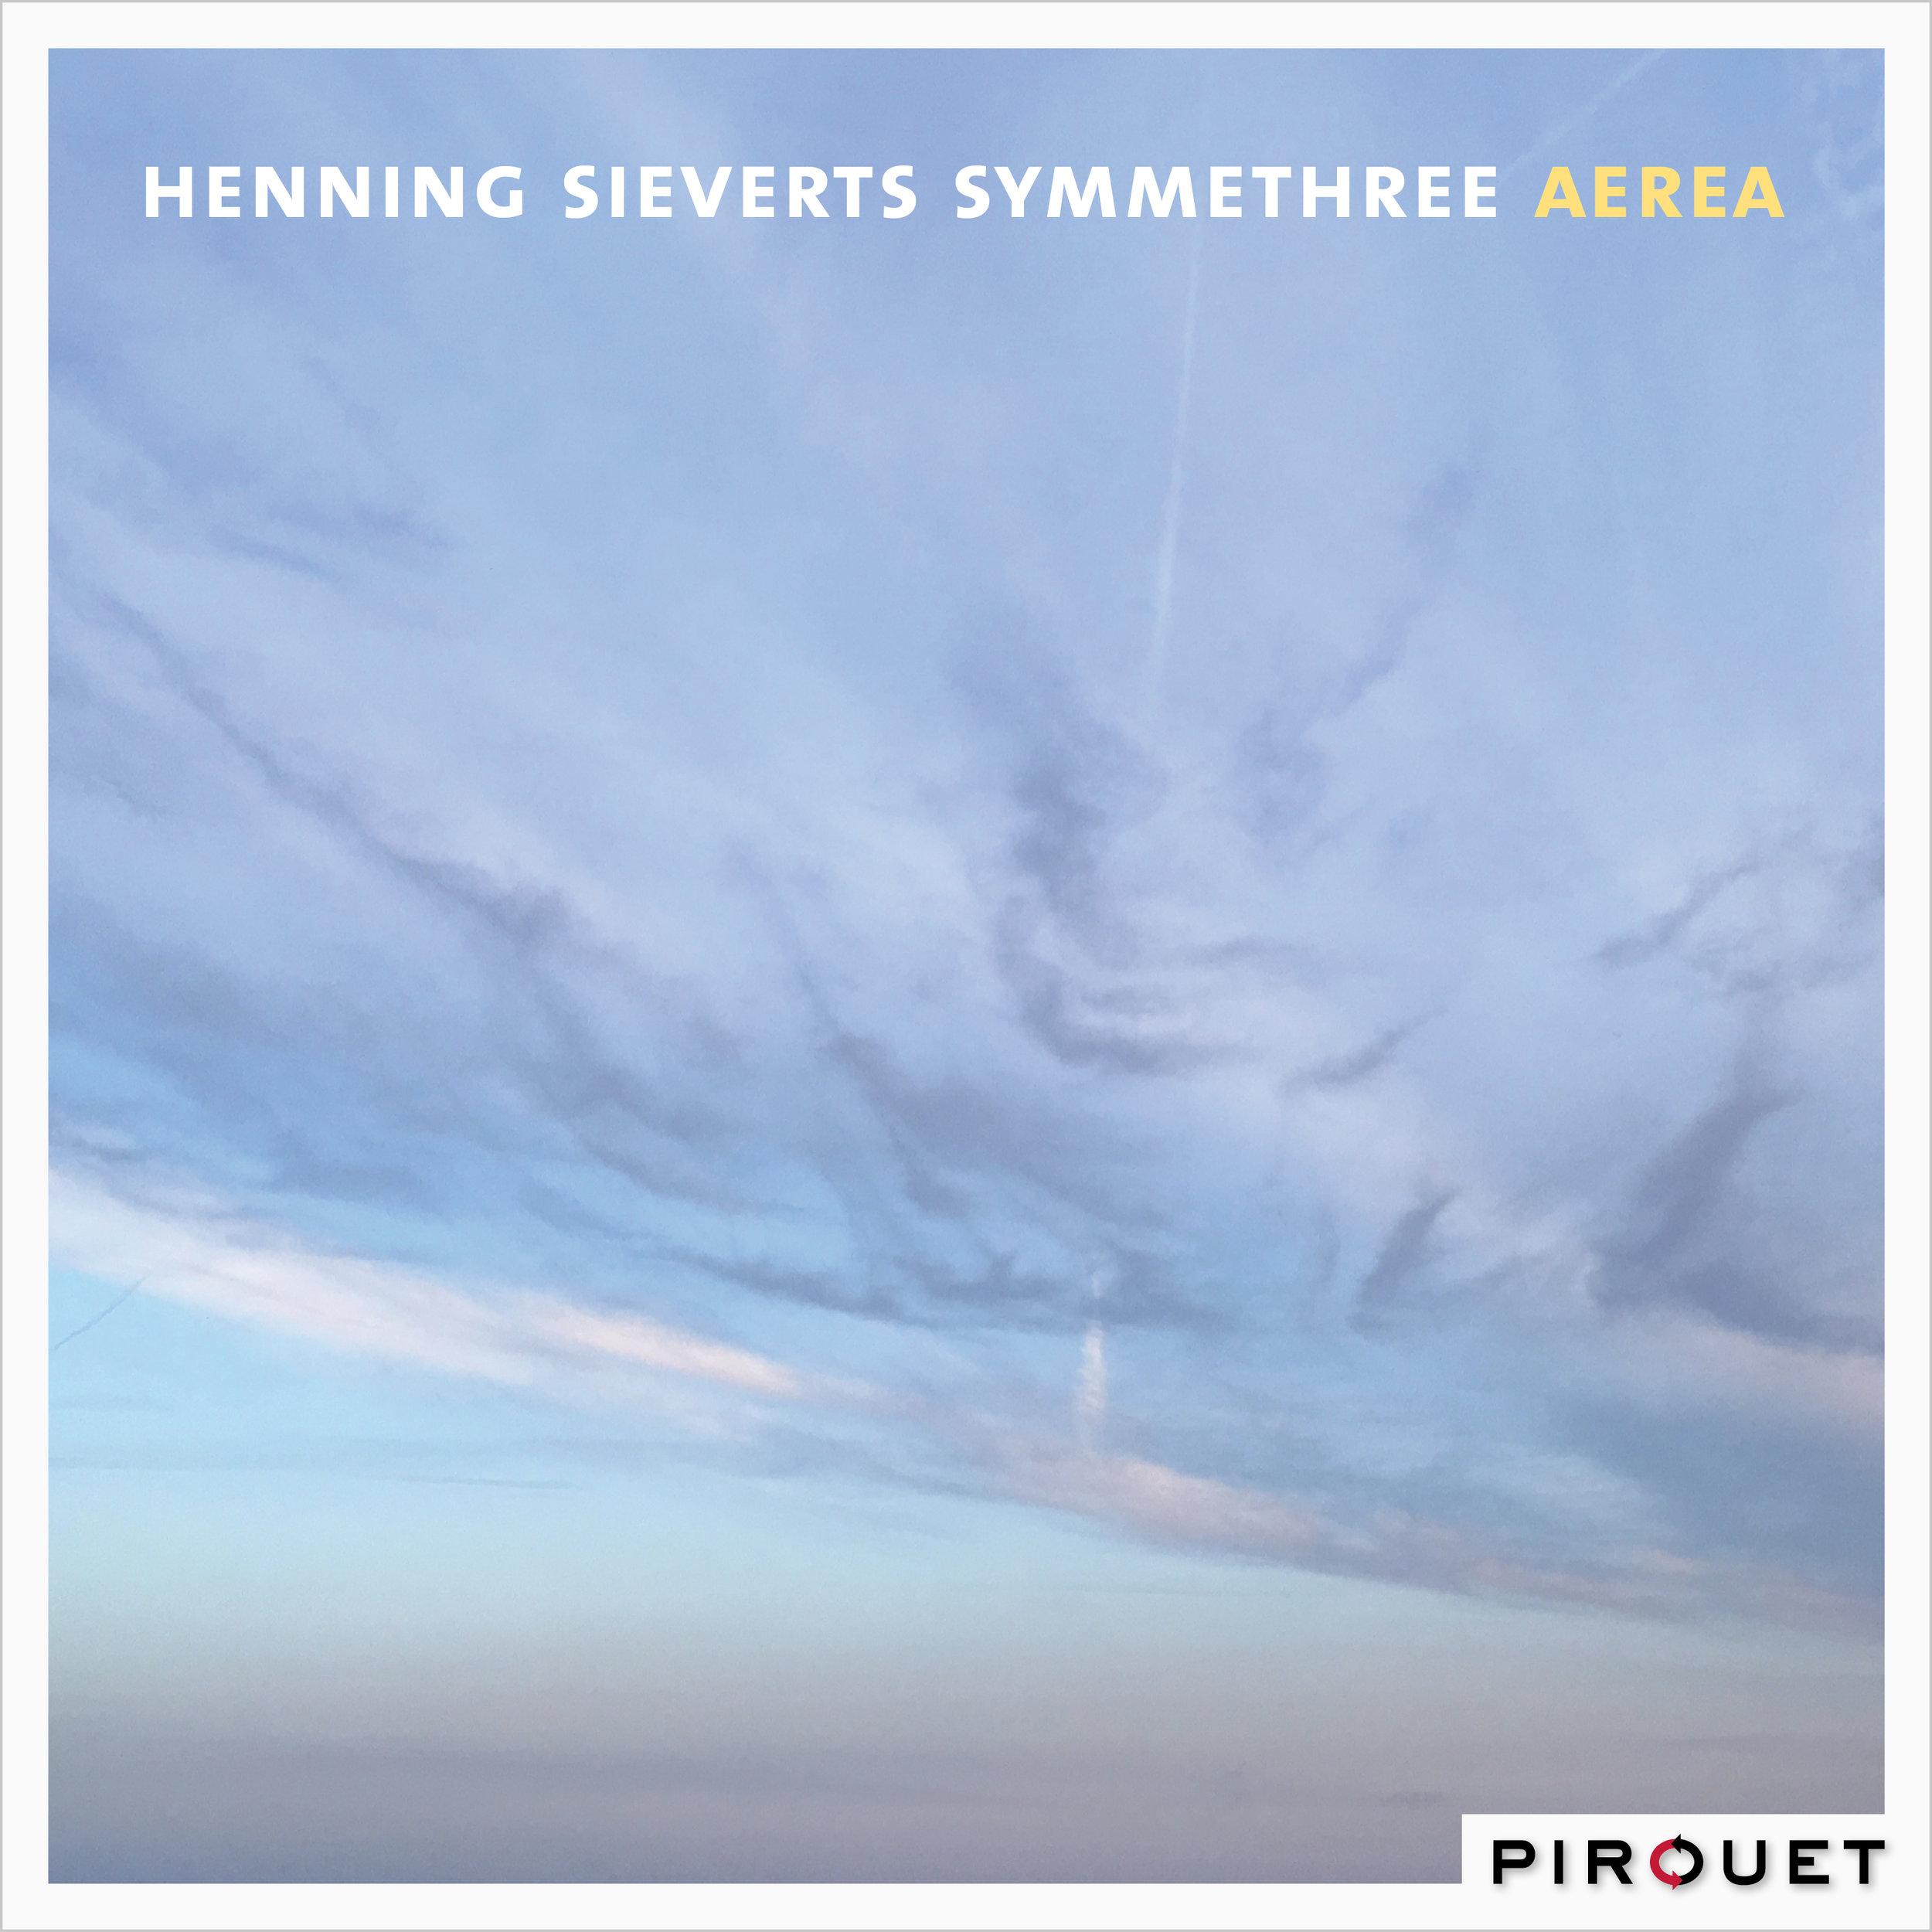 PIT3101_cover_Henning Sieverts Symmethree-Aerea.jpg